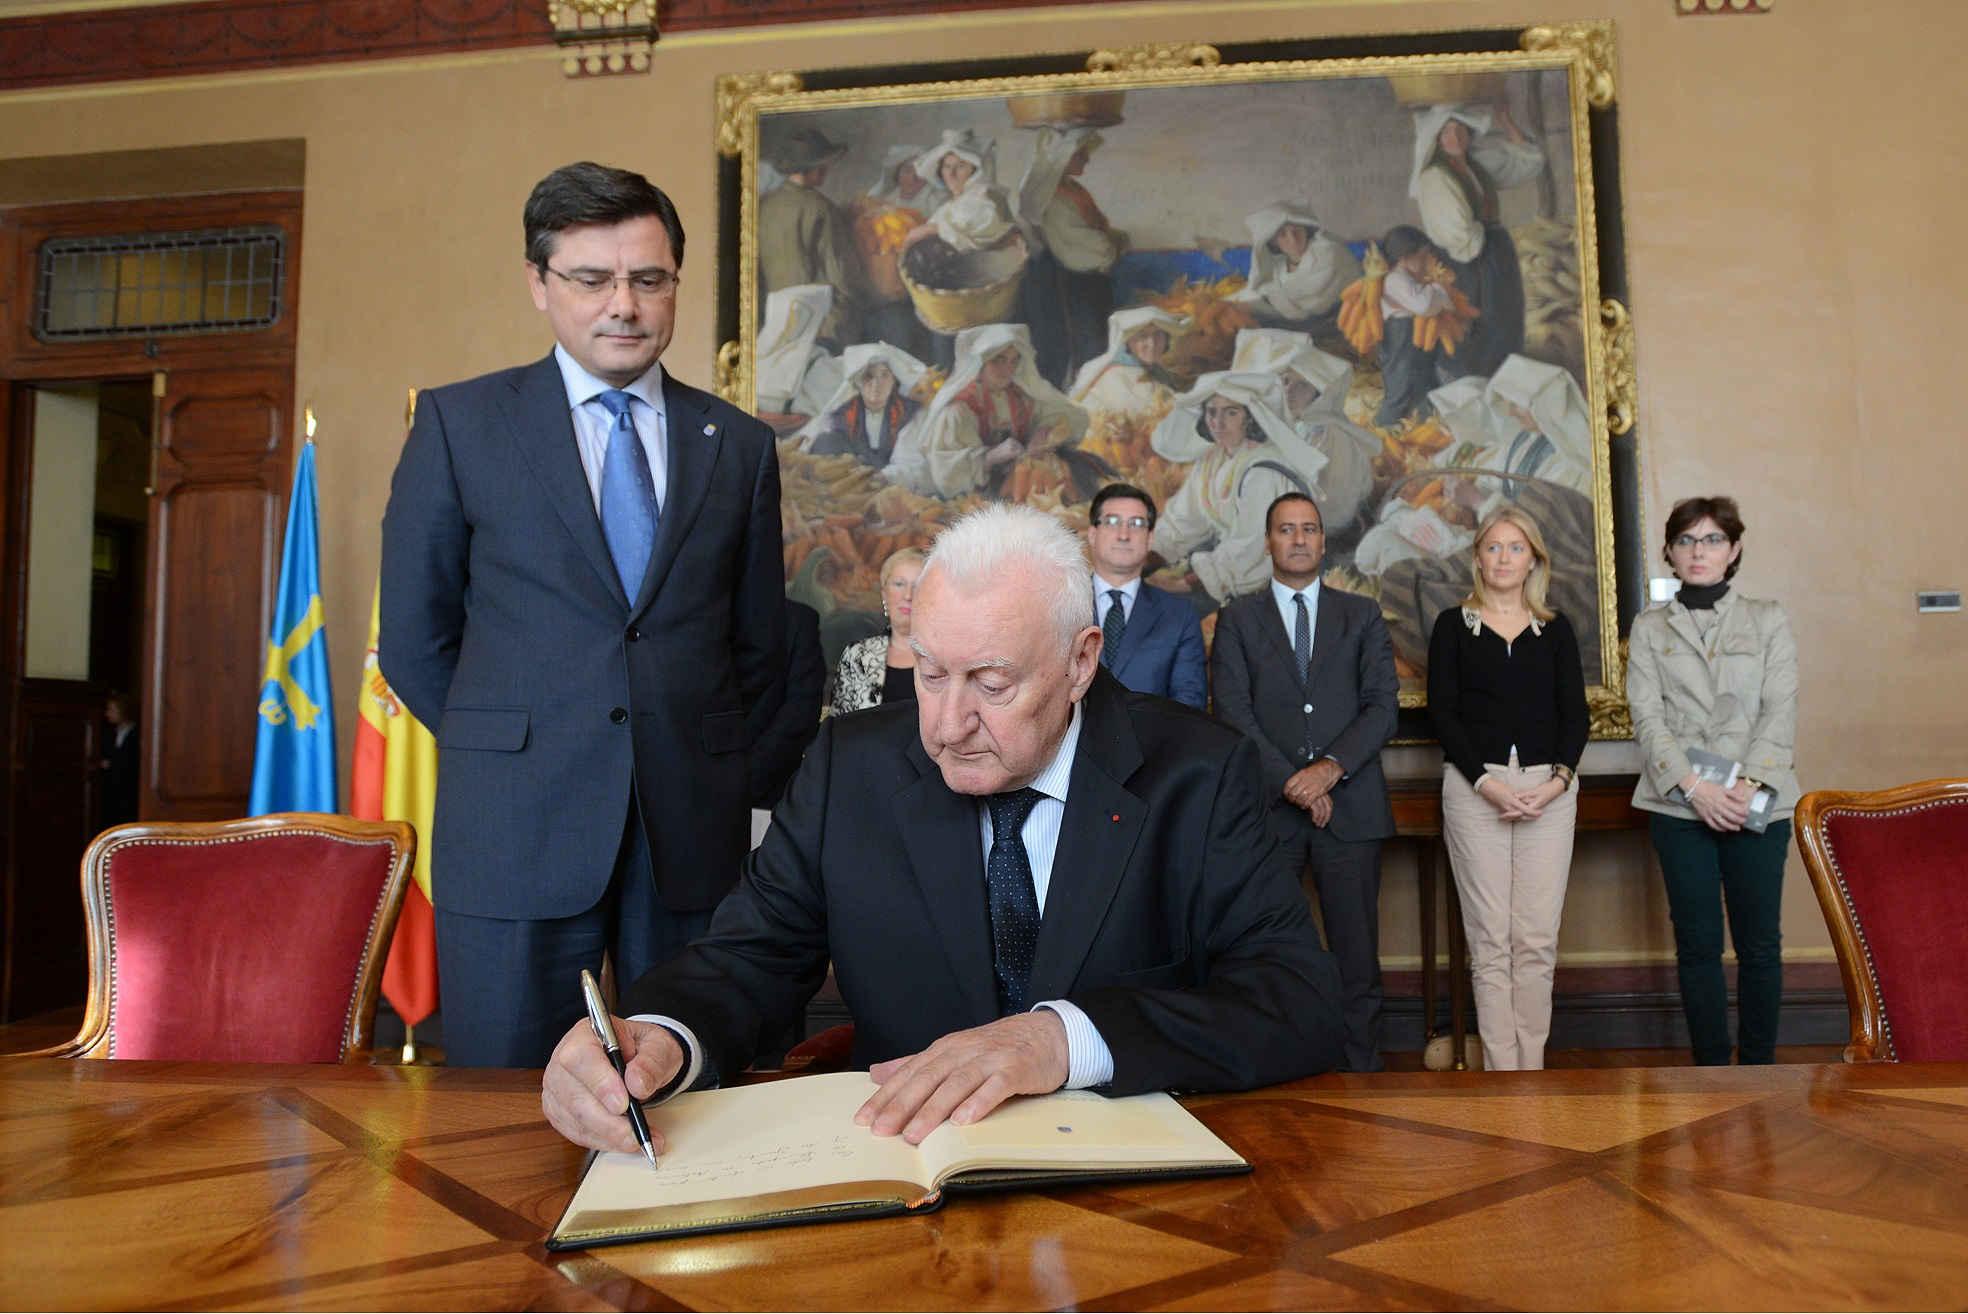 Visita de Joseph Pérez a la Junta General del Principado de Asturias